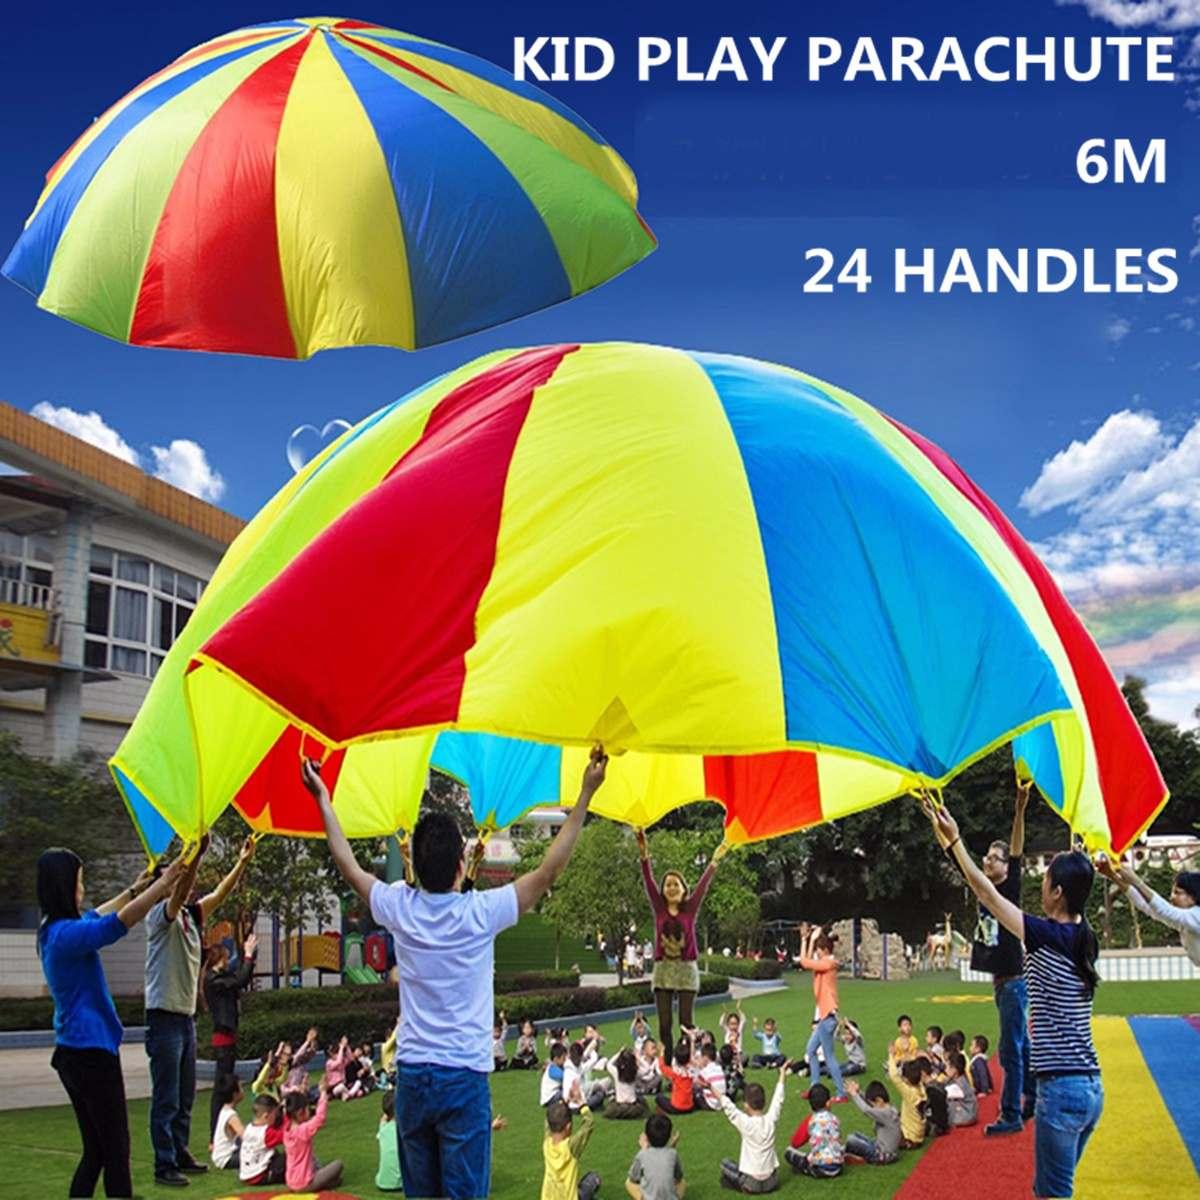 6M Rainbow Parachute Game 24 Handles Kids Play Parachute Rainbow Umbrella Parachute Outdoor Sports Children Interactive Toy6M Rainbow Parachute Game 24 Handles Kids Play Parachute Rainbow Umbrella Parachute Outdoor Sports Children Interactive Toy